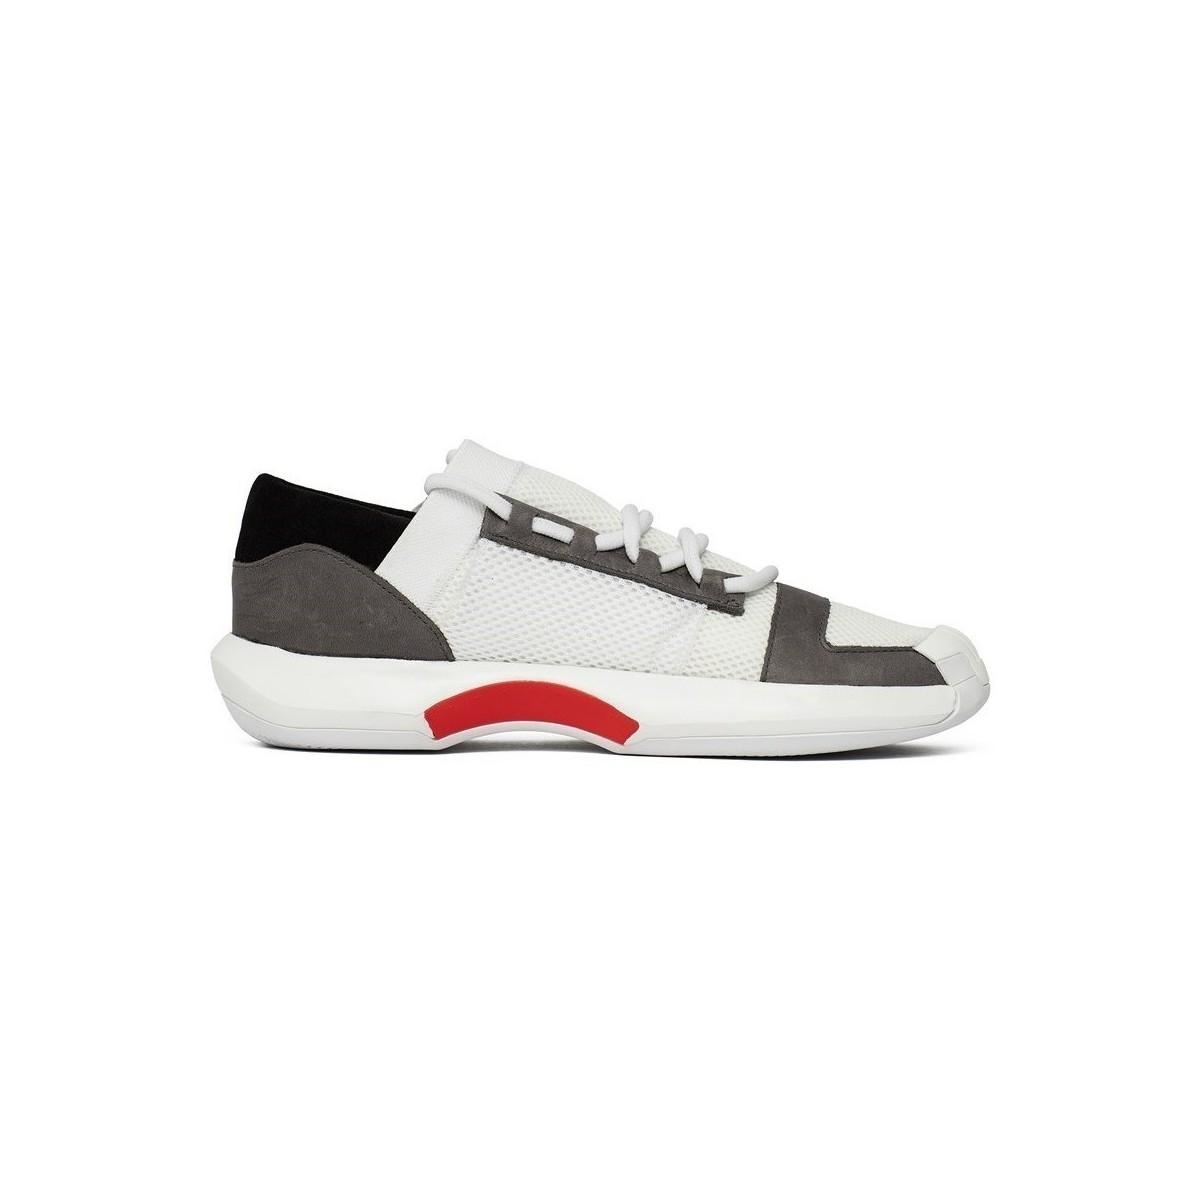 new arrivals e0de3 9333e Adidas - Consortium Crazy 1 Ad Mens Shoes (trainers) In White for Men -.  View fullscreen